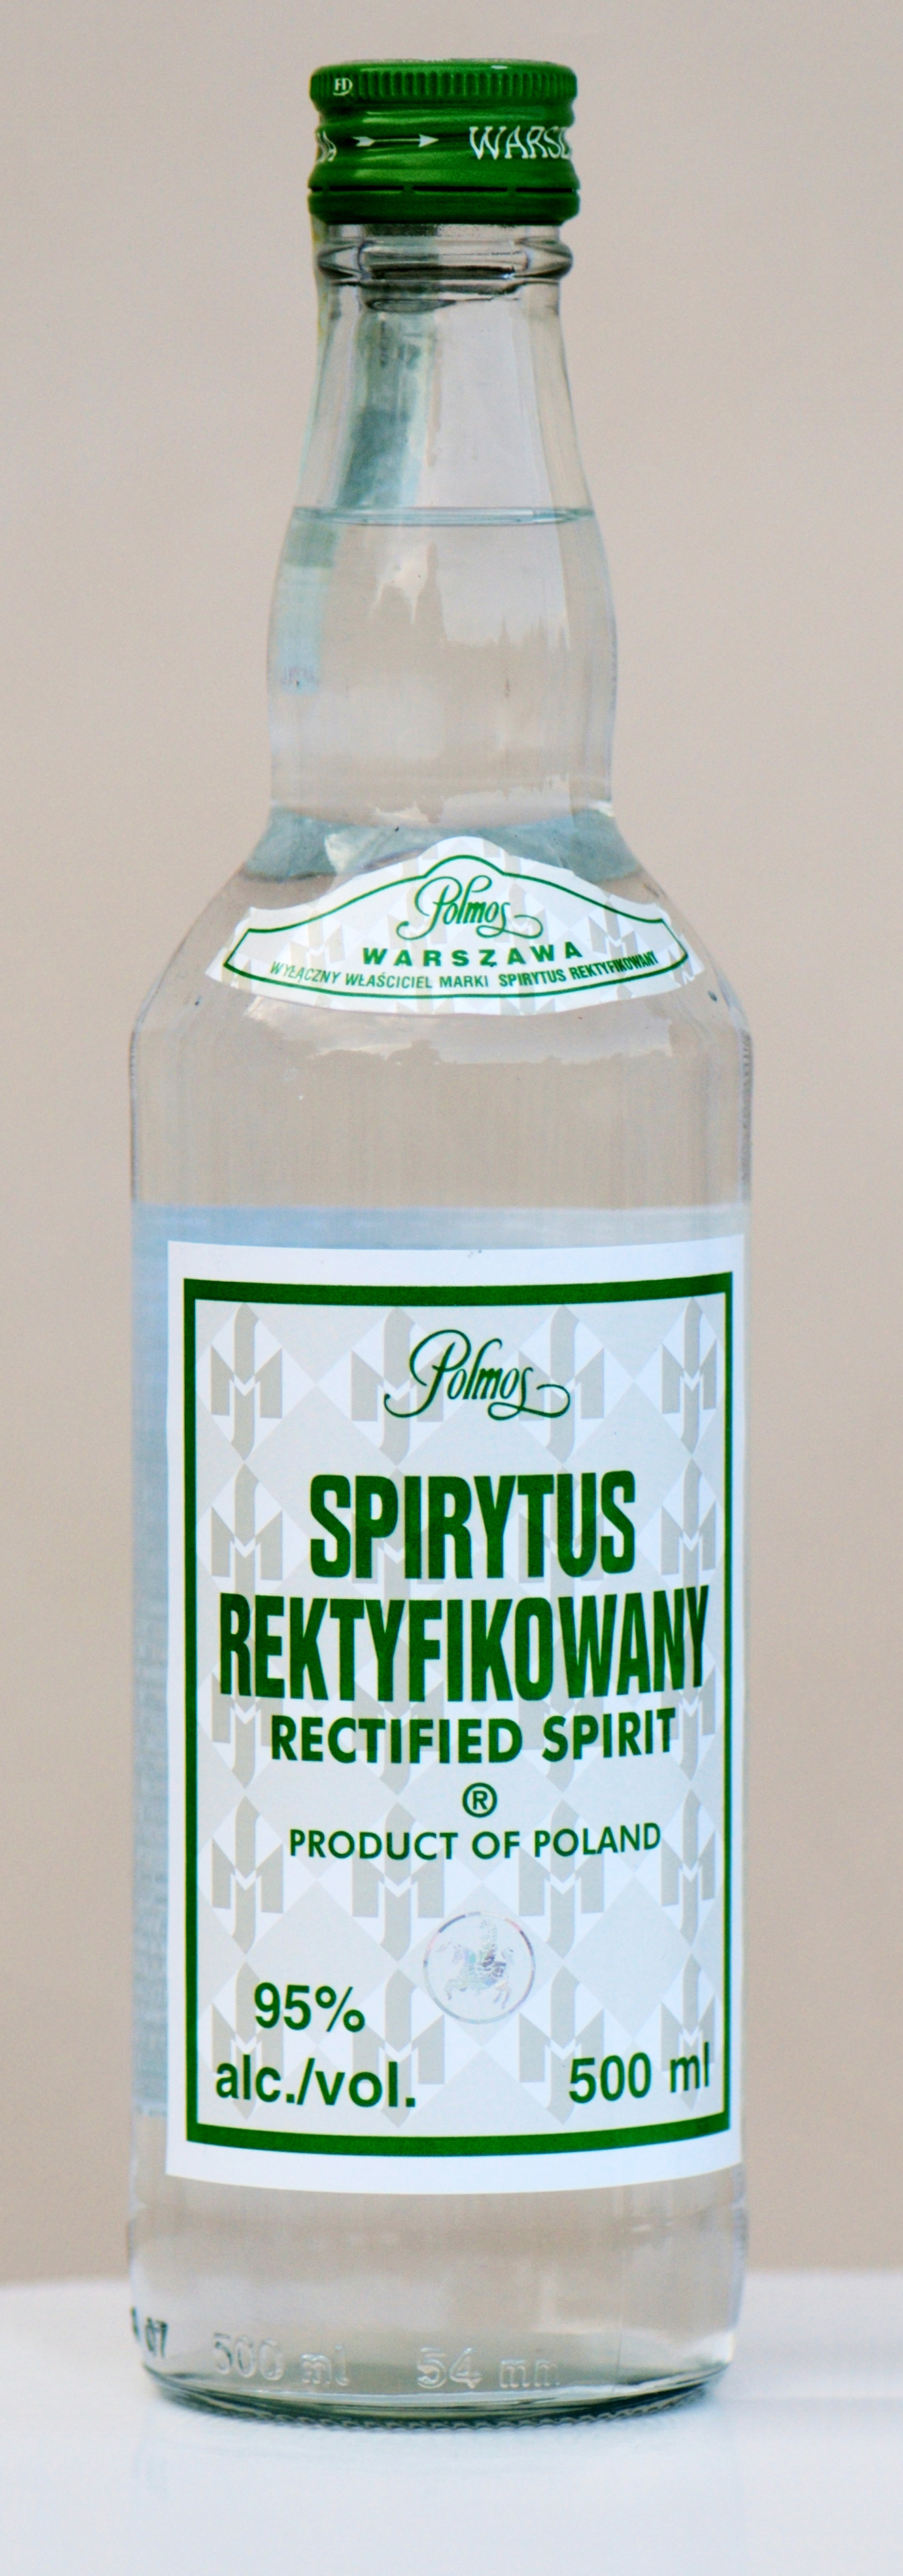 Rectified spirit - Wikiwand